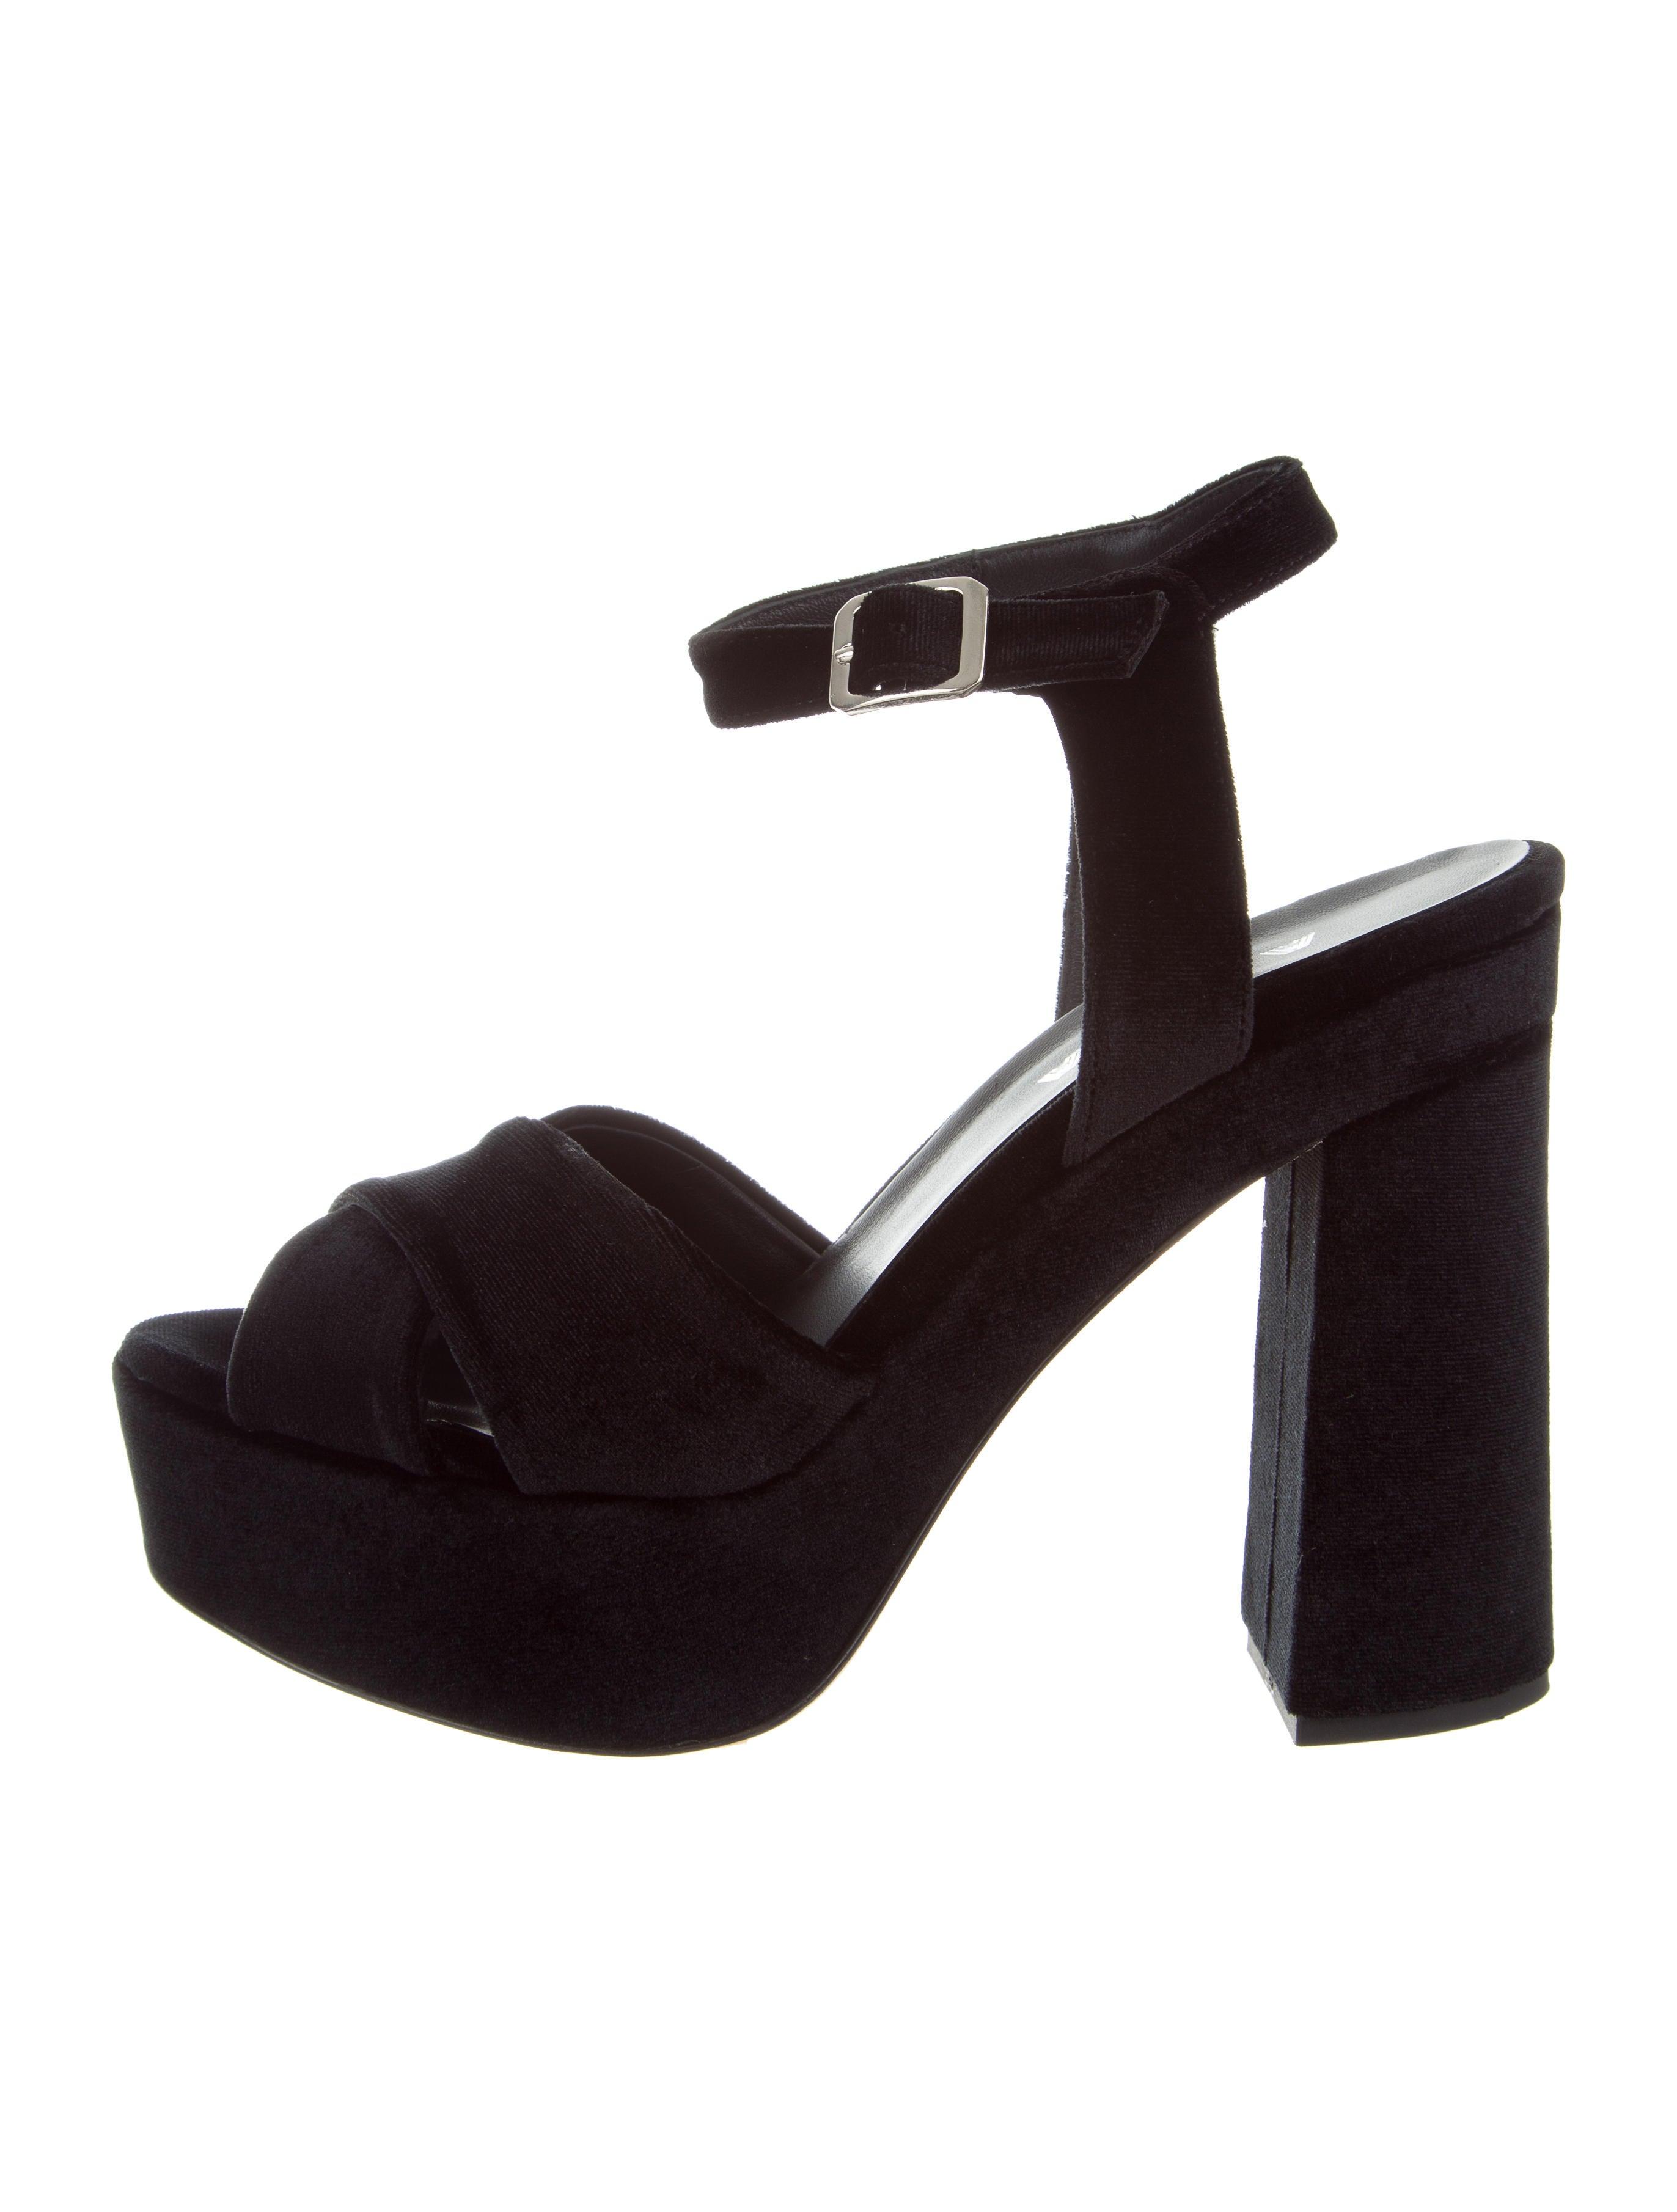 Aska Suede Platform Sandals cheap 100% guaranteed largest supplier cheap online D8Hpp